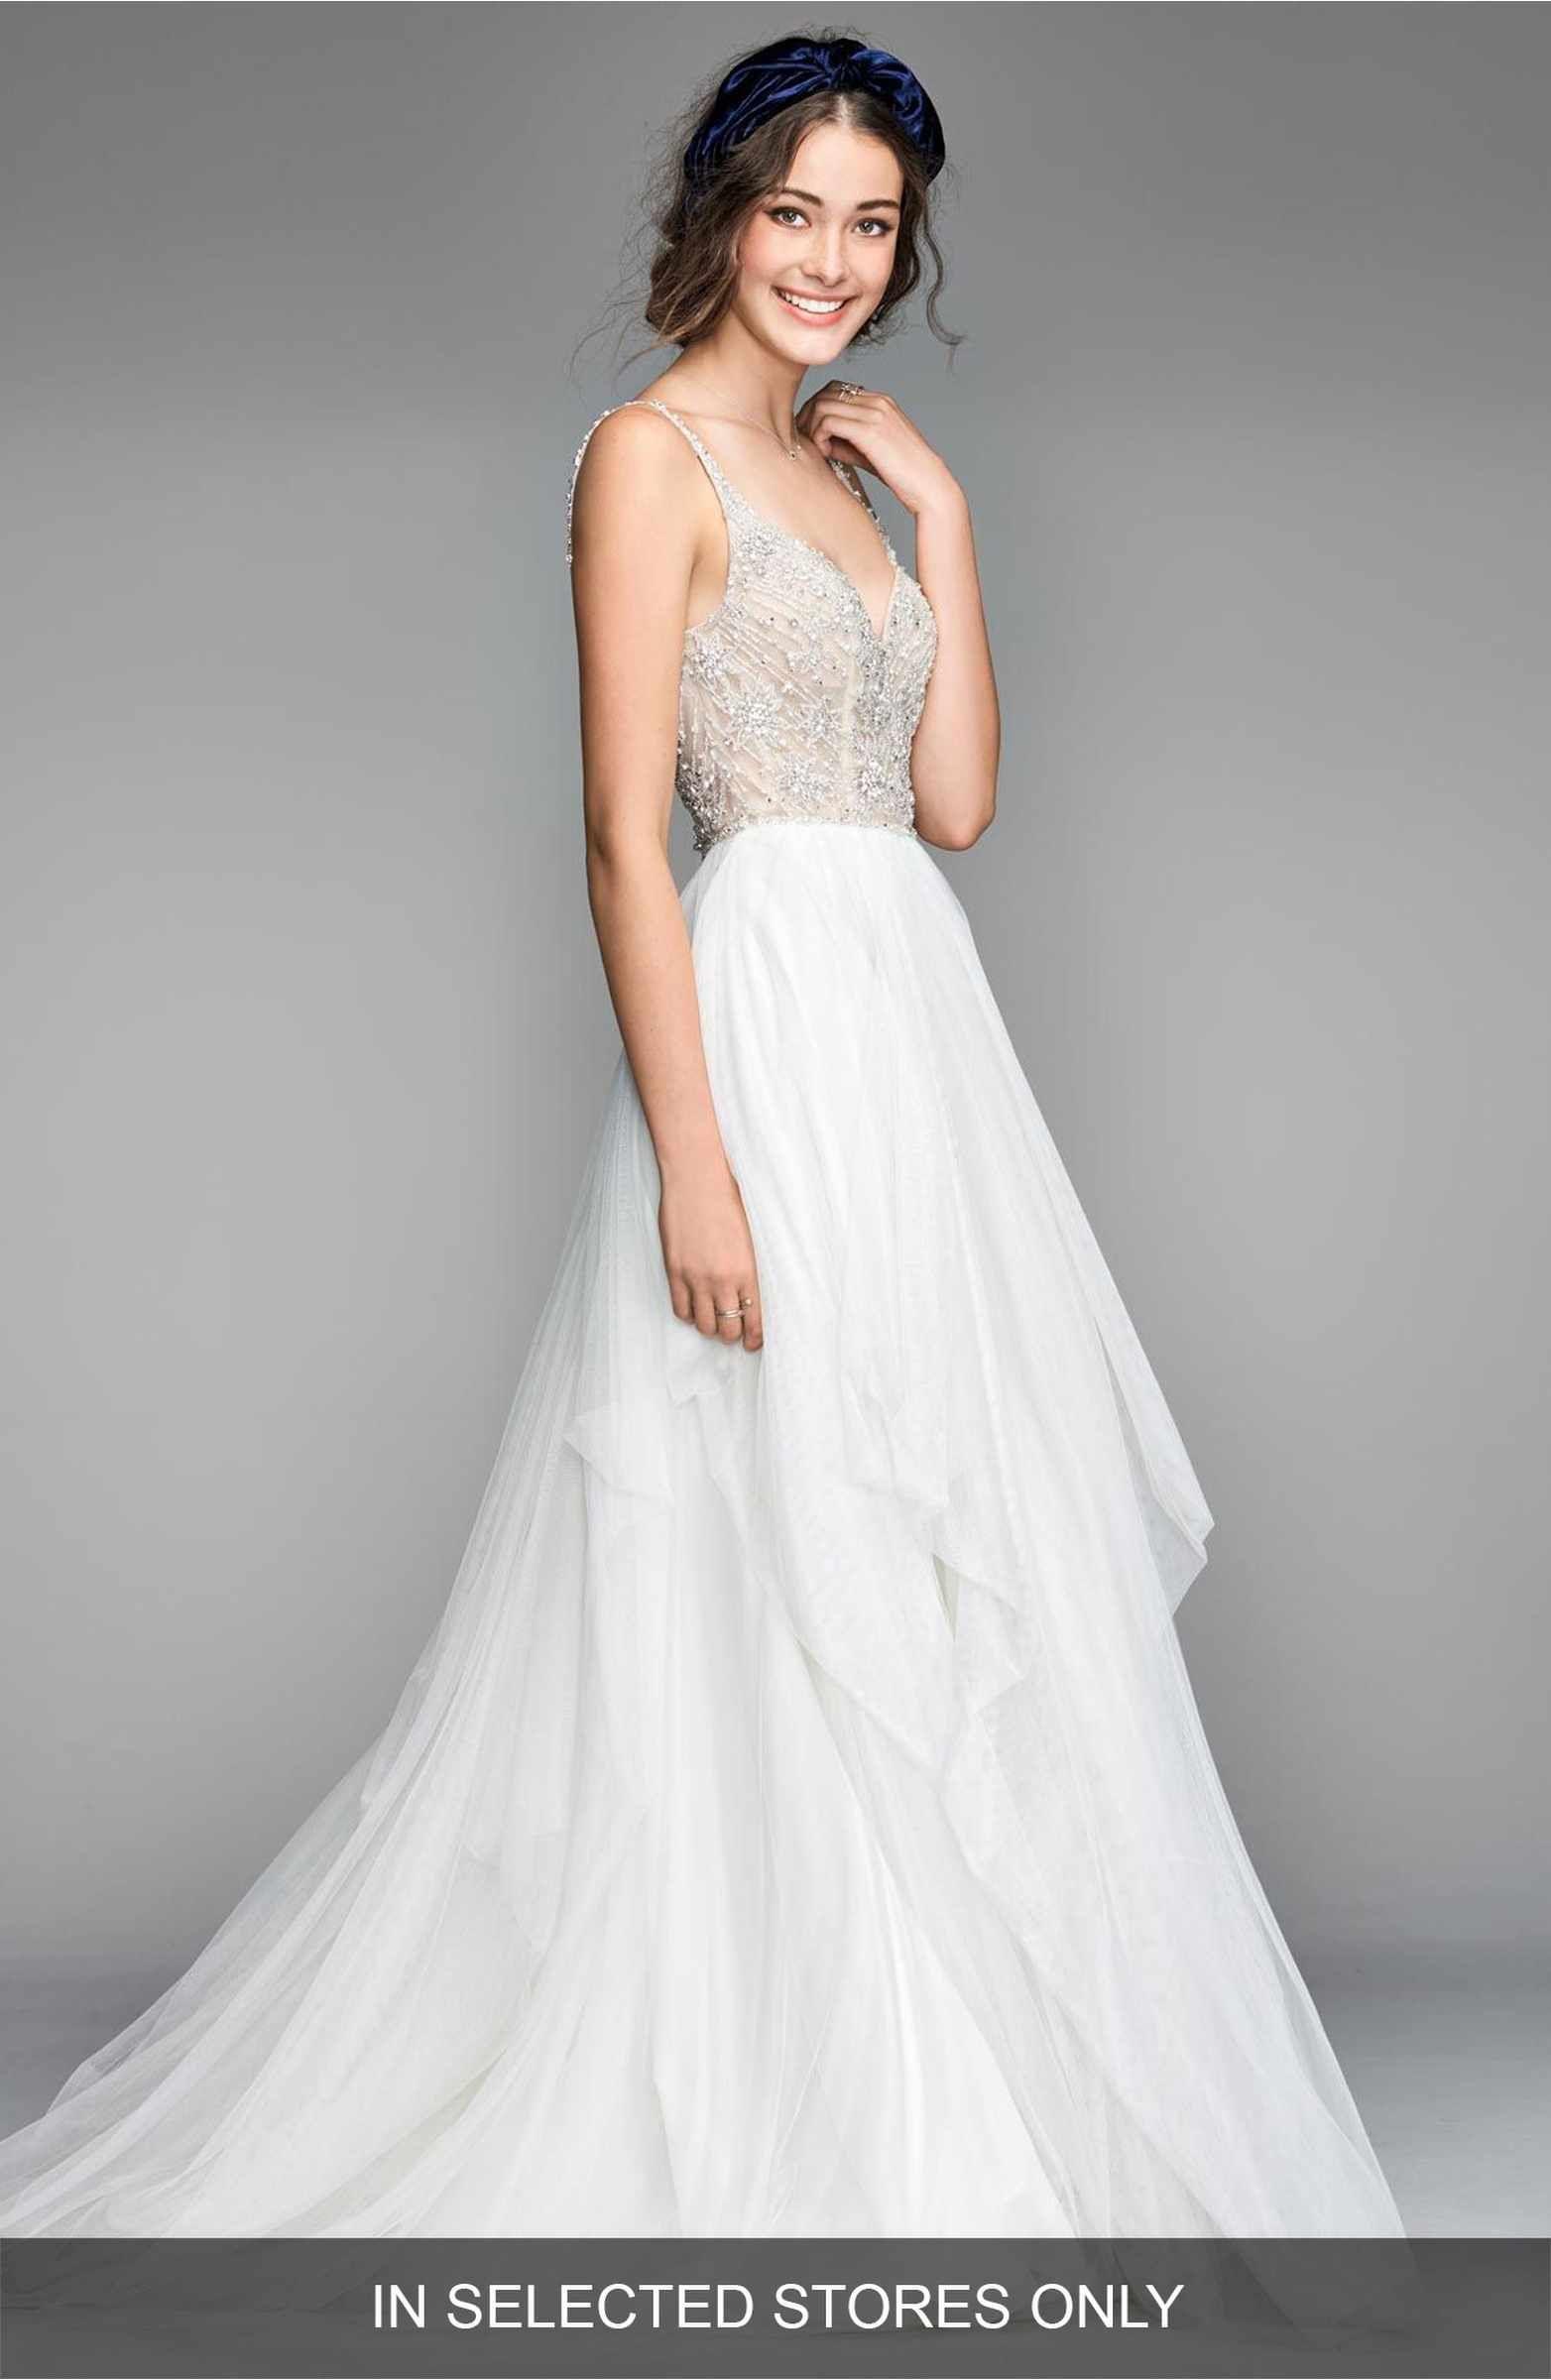 Main Image - Willowby Nova Beaded Bodice Tulle Gown | Love Love Love ...